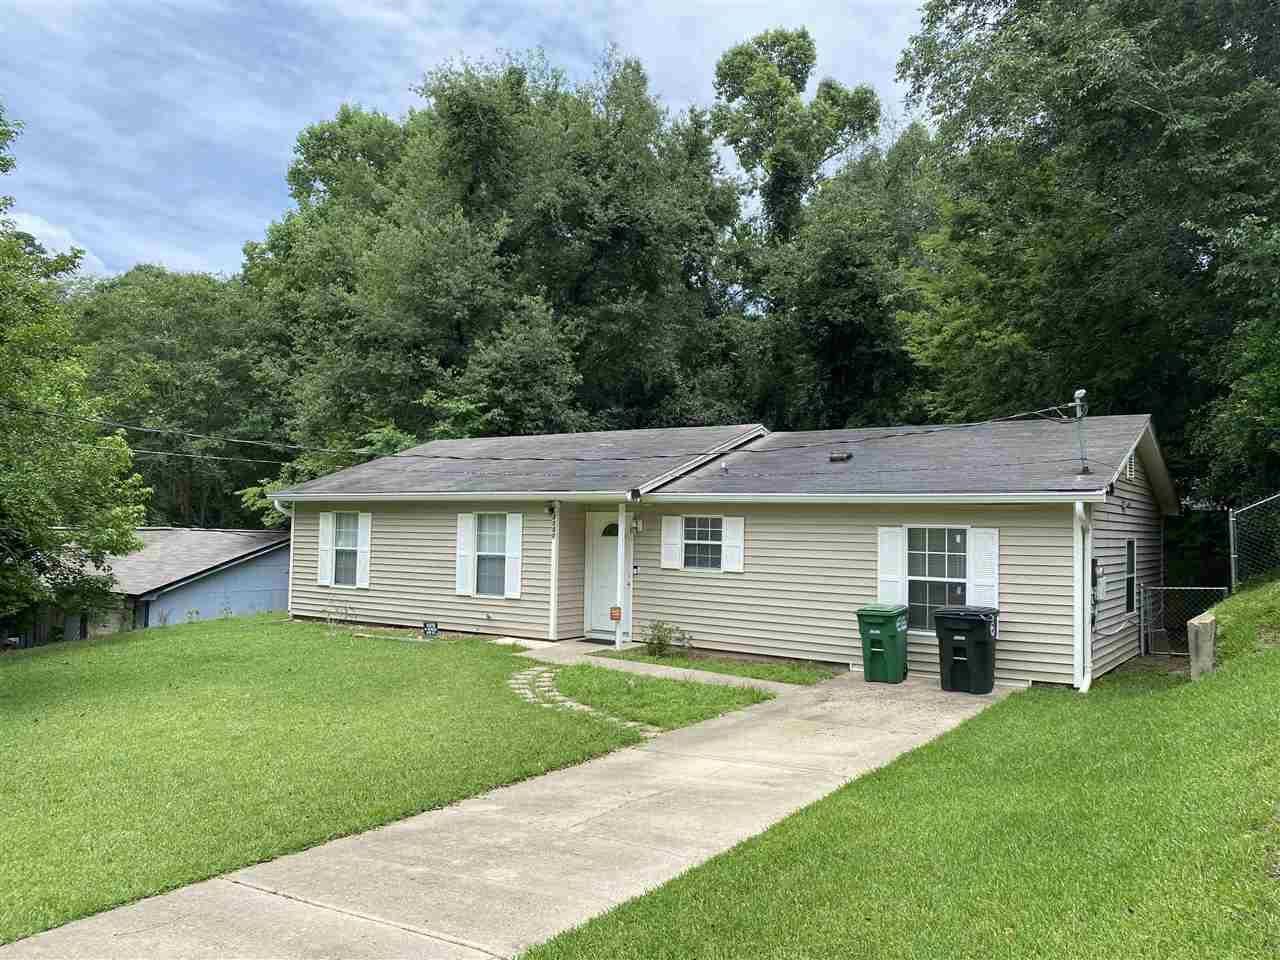 Photo of 4039 Sonnet Drive, TALLAHASSEE, FL 32303 (MLS # 334254)